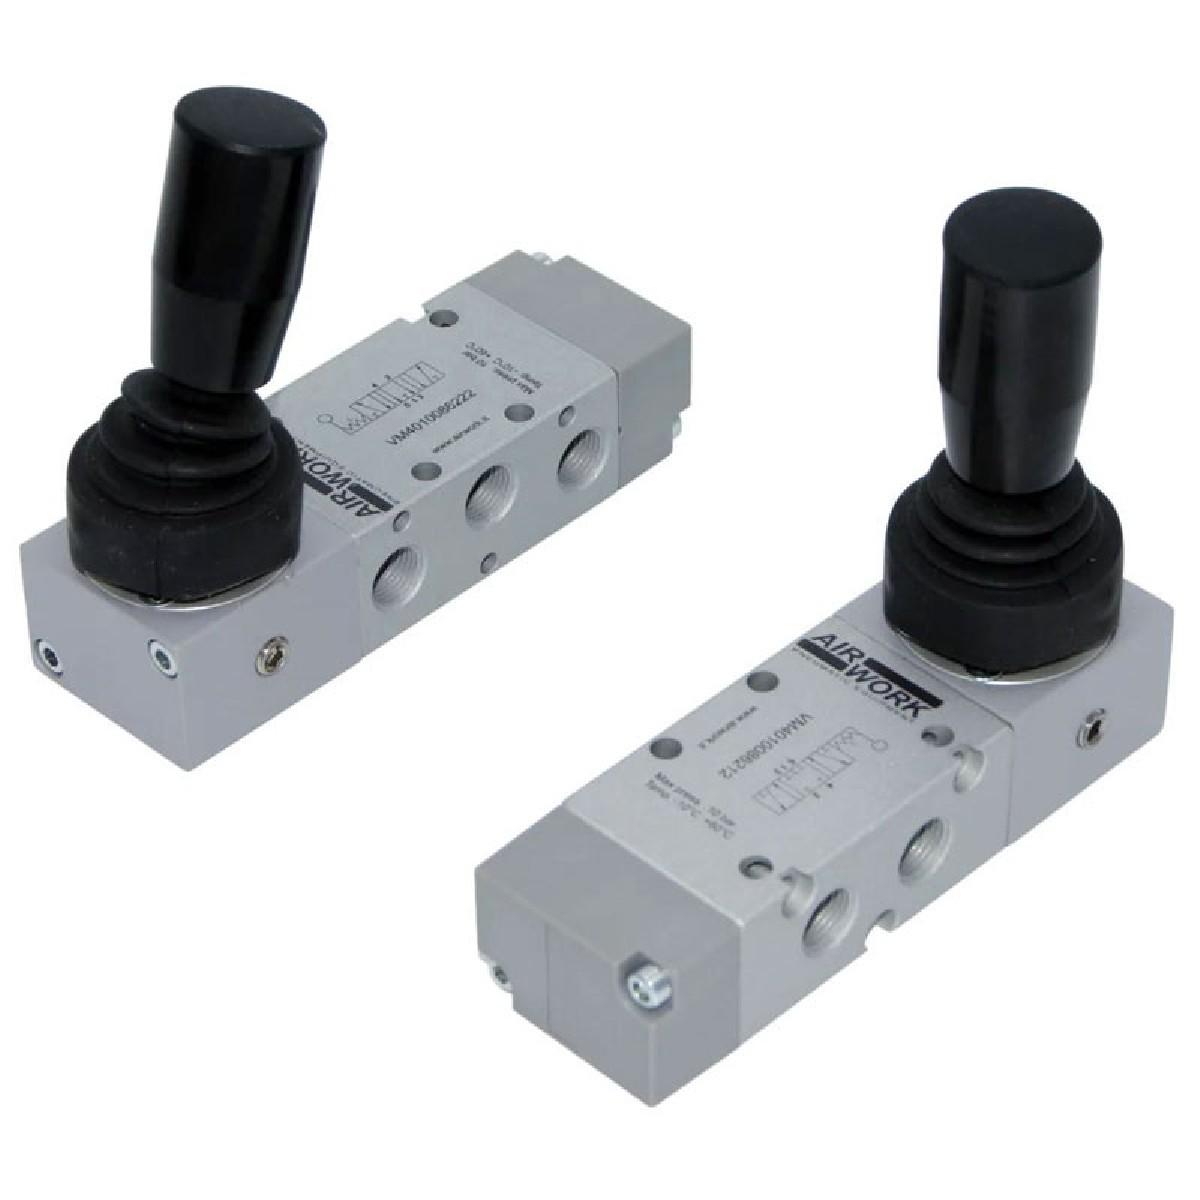 Davair Pneumatic Valves - Manual Valves, VM Series